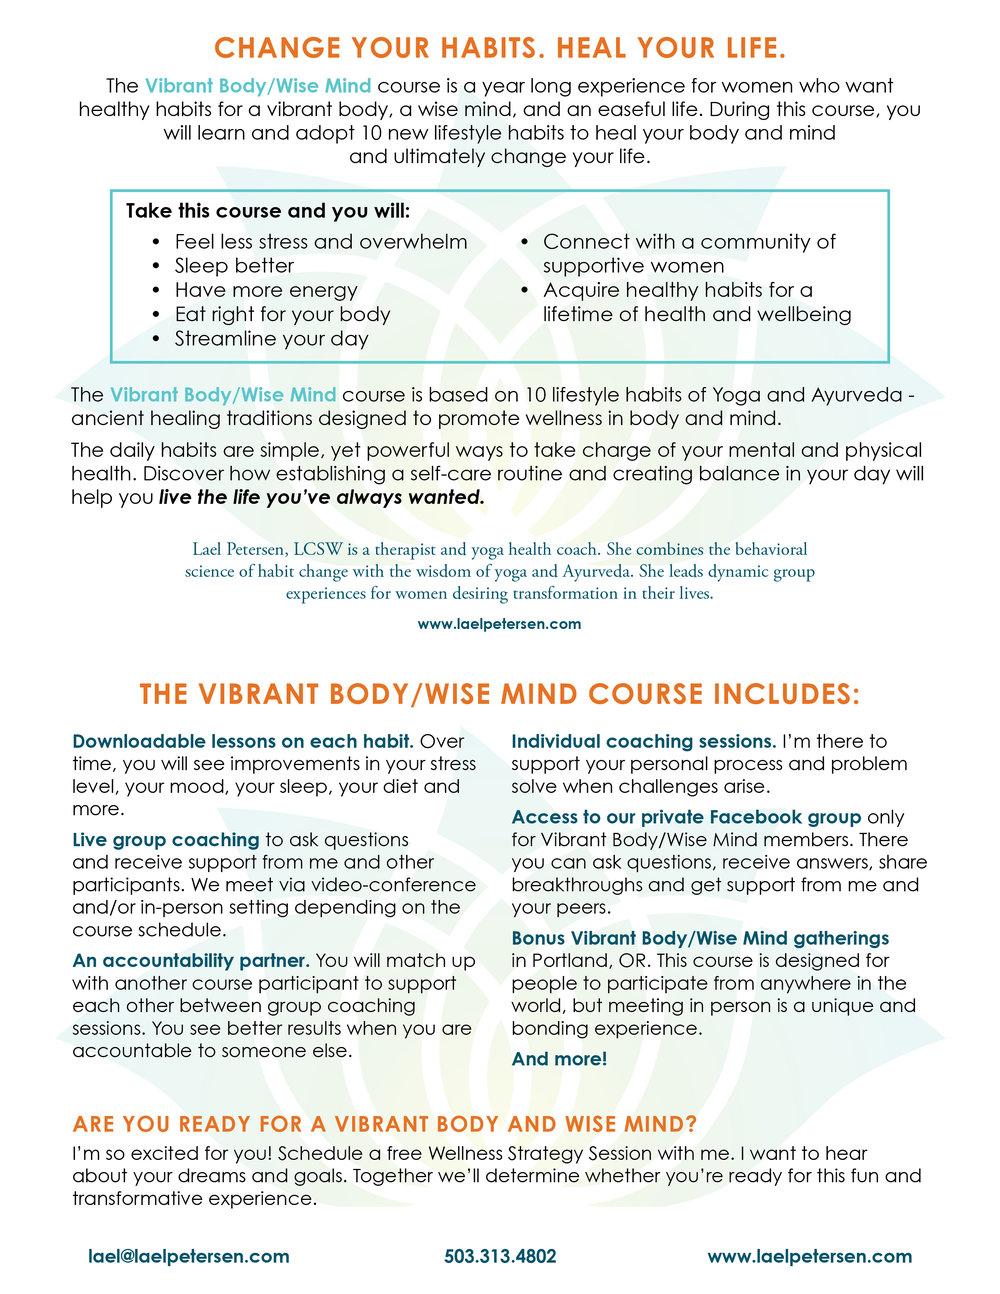 VBWM_course_flyer.jpg